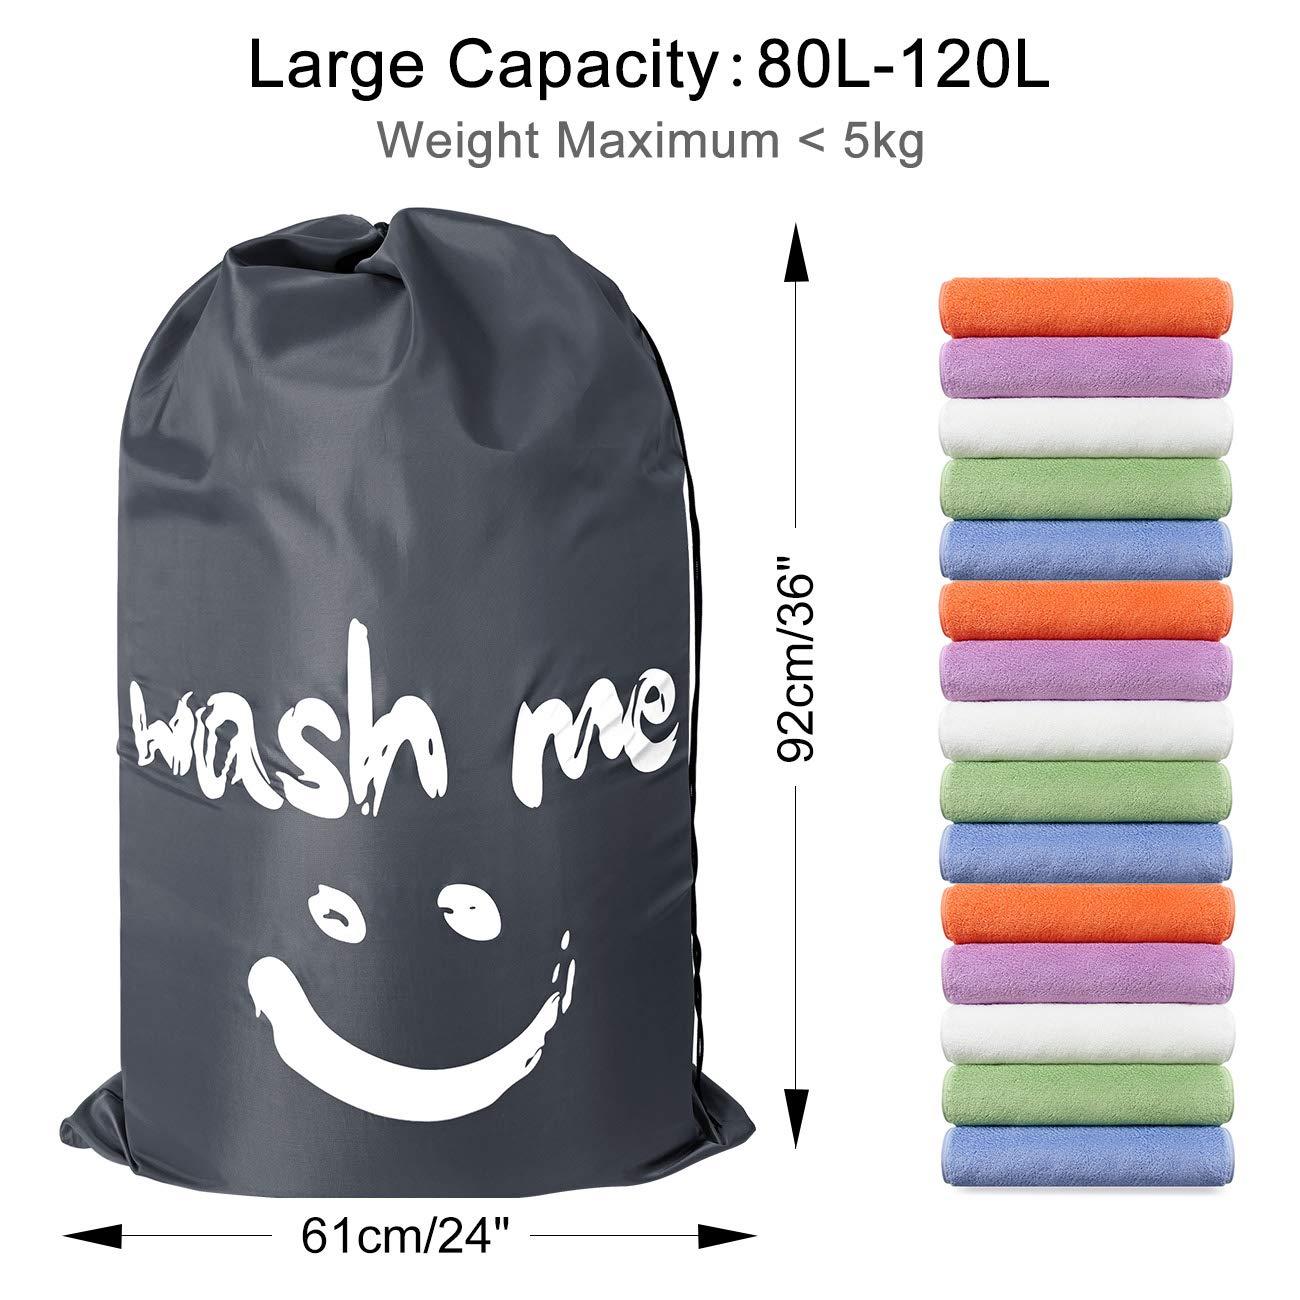 ZERO JET LAG 2 Pack Extra Large Travel Laundry Bag Set Nylon Rip-Stop Dirty Storage Bag Machine Washable Drawstring Closure 24'' x 36'' (Blue and Gray) by ZERO JET LAG (Image #9)